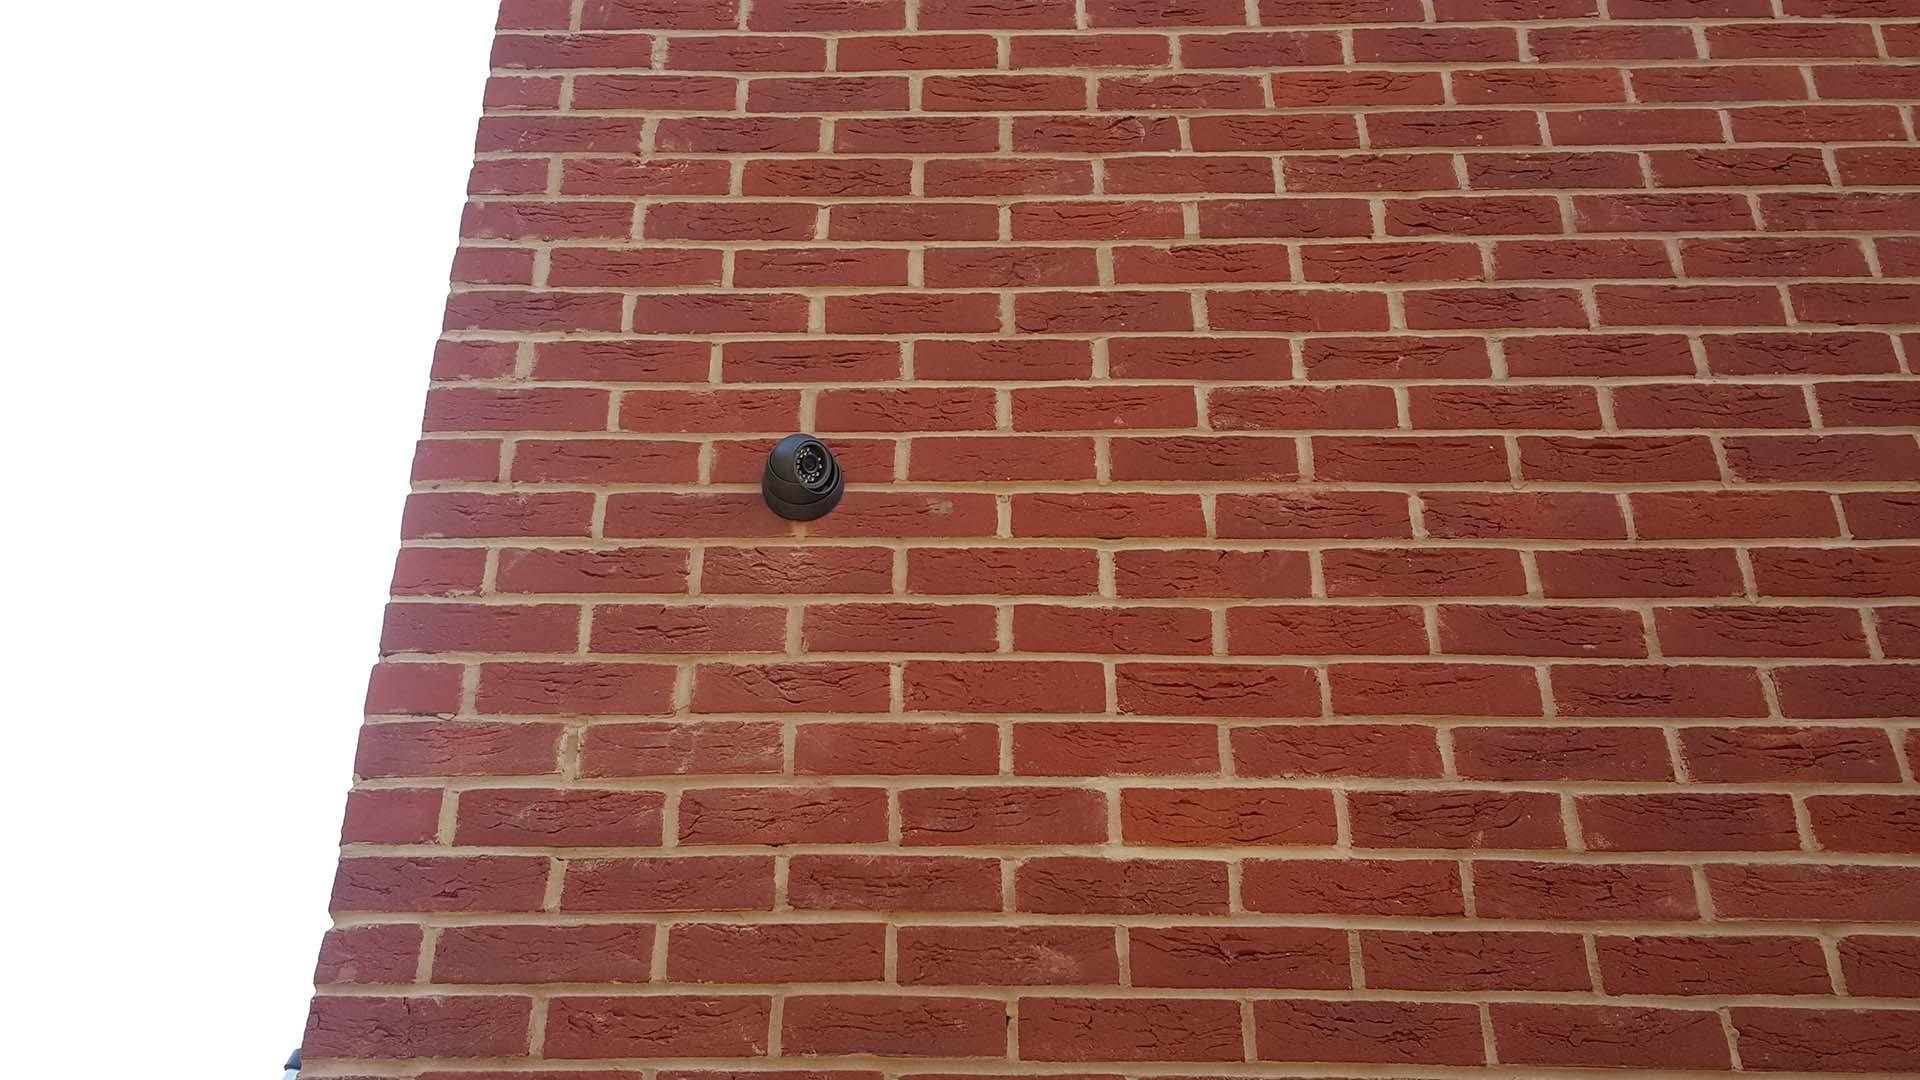 CCTV Installation in Aylesford